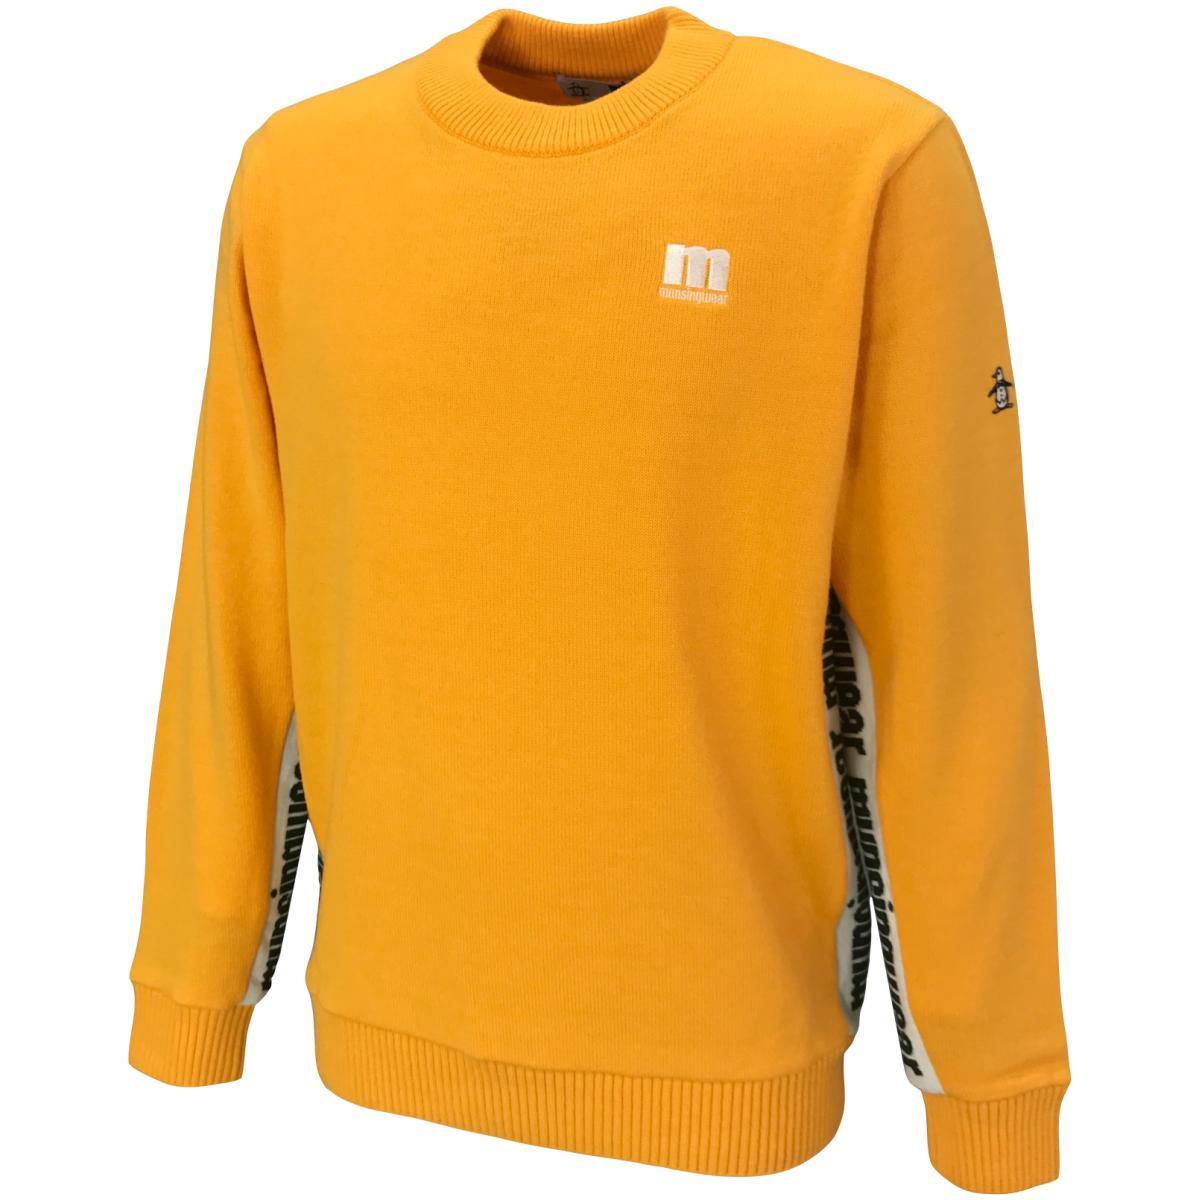 ENVOY ロゴジャカードクルーセーター